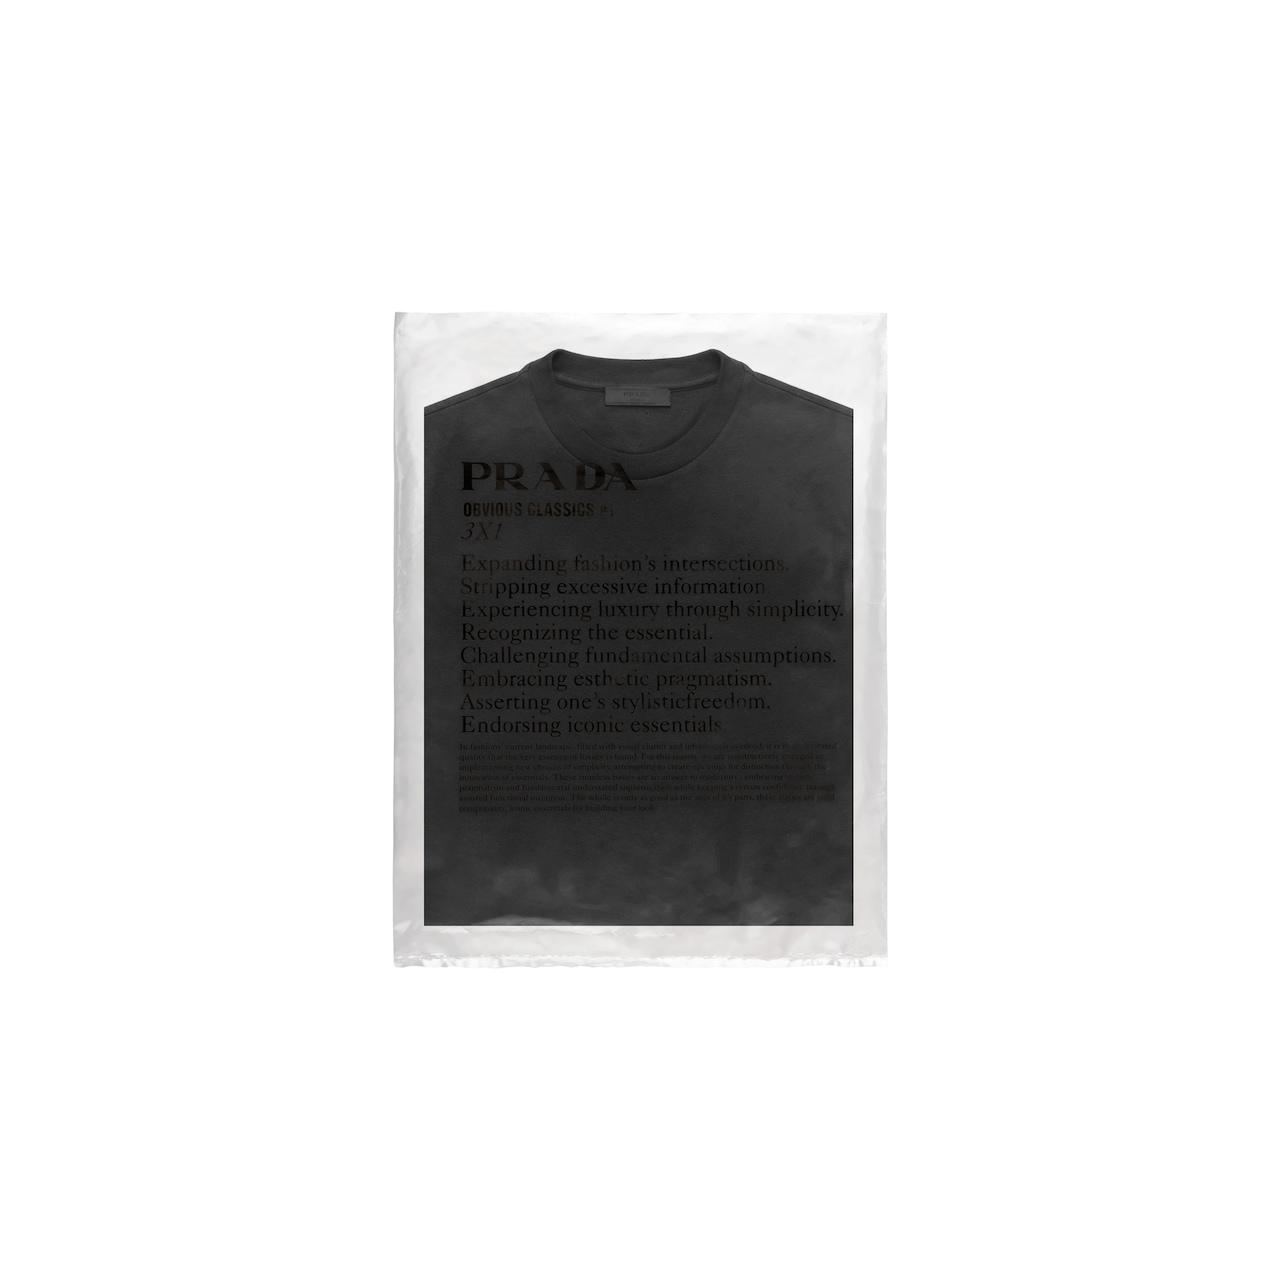 Three Pack Cotton Jersey T-Shirts